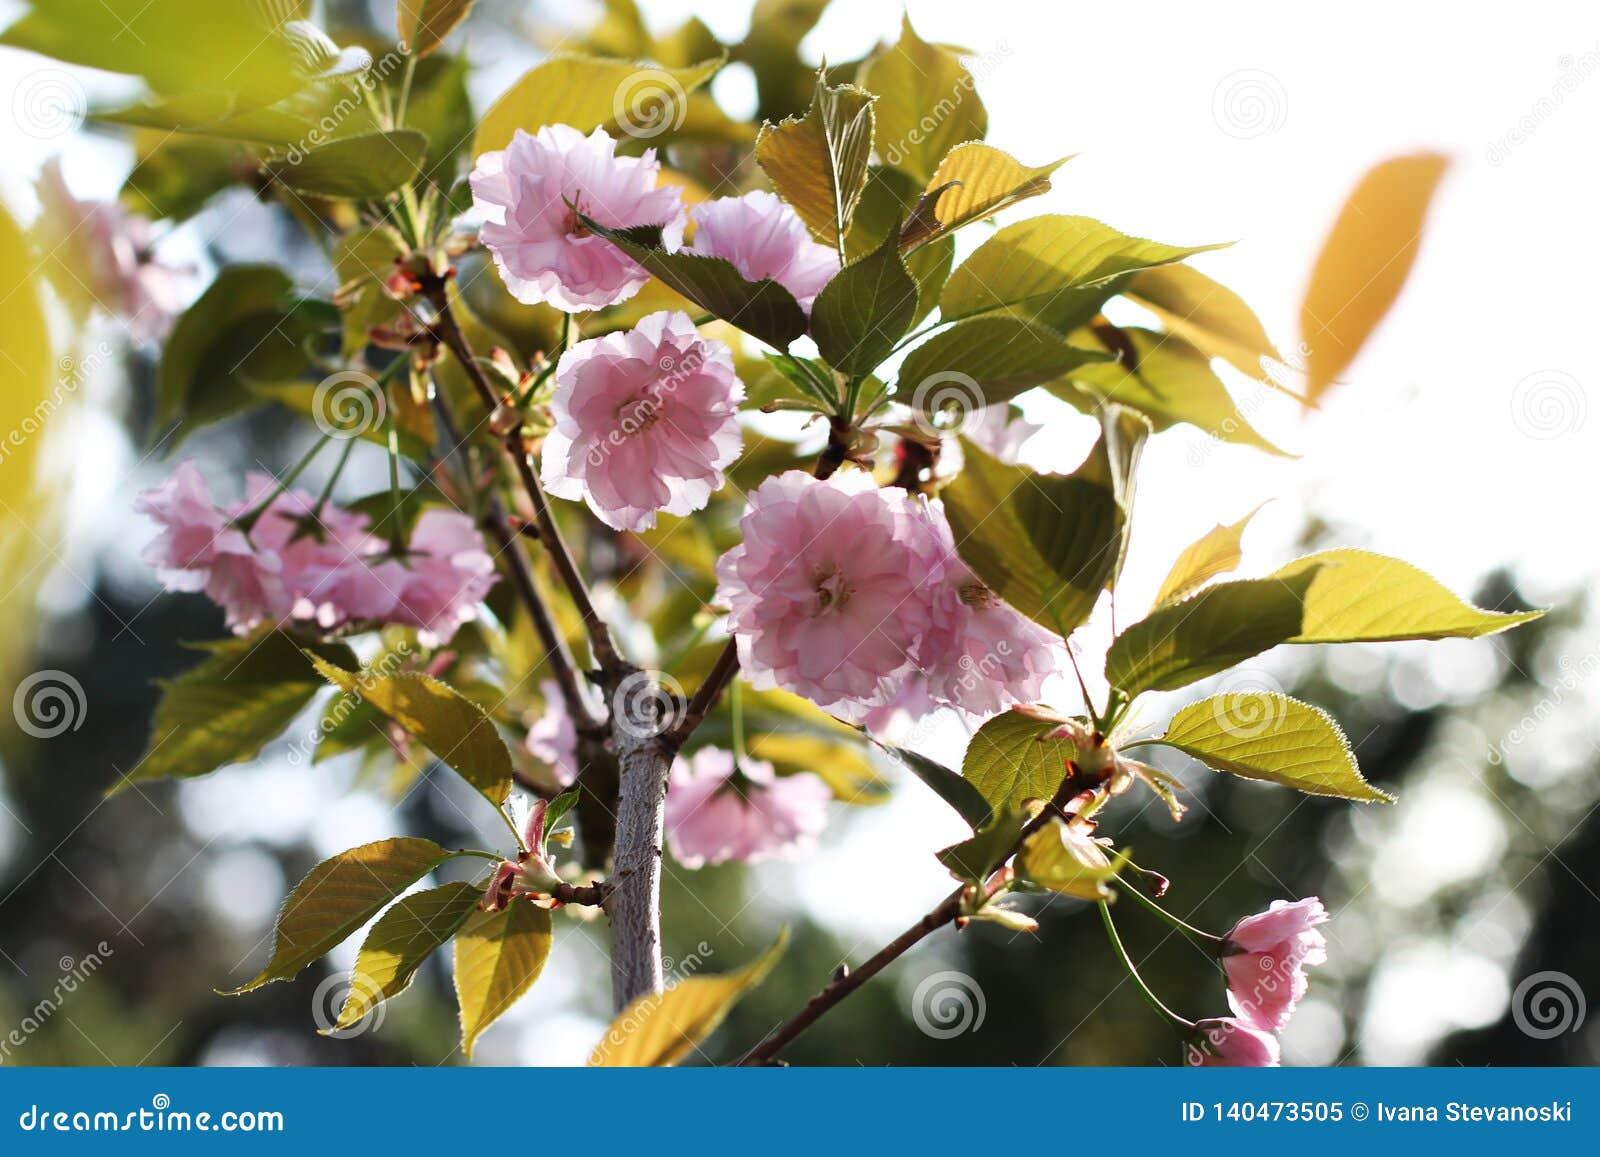 Pink Flowers Of Japanese Cherry Tree Stock Image Image Of Japanese